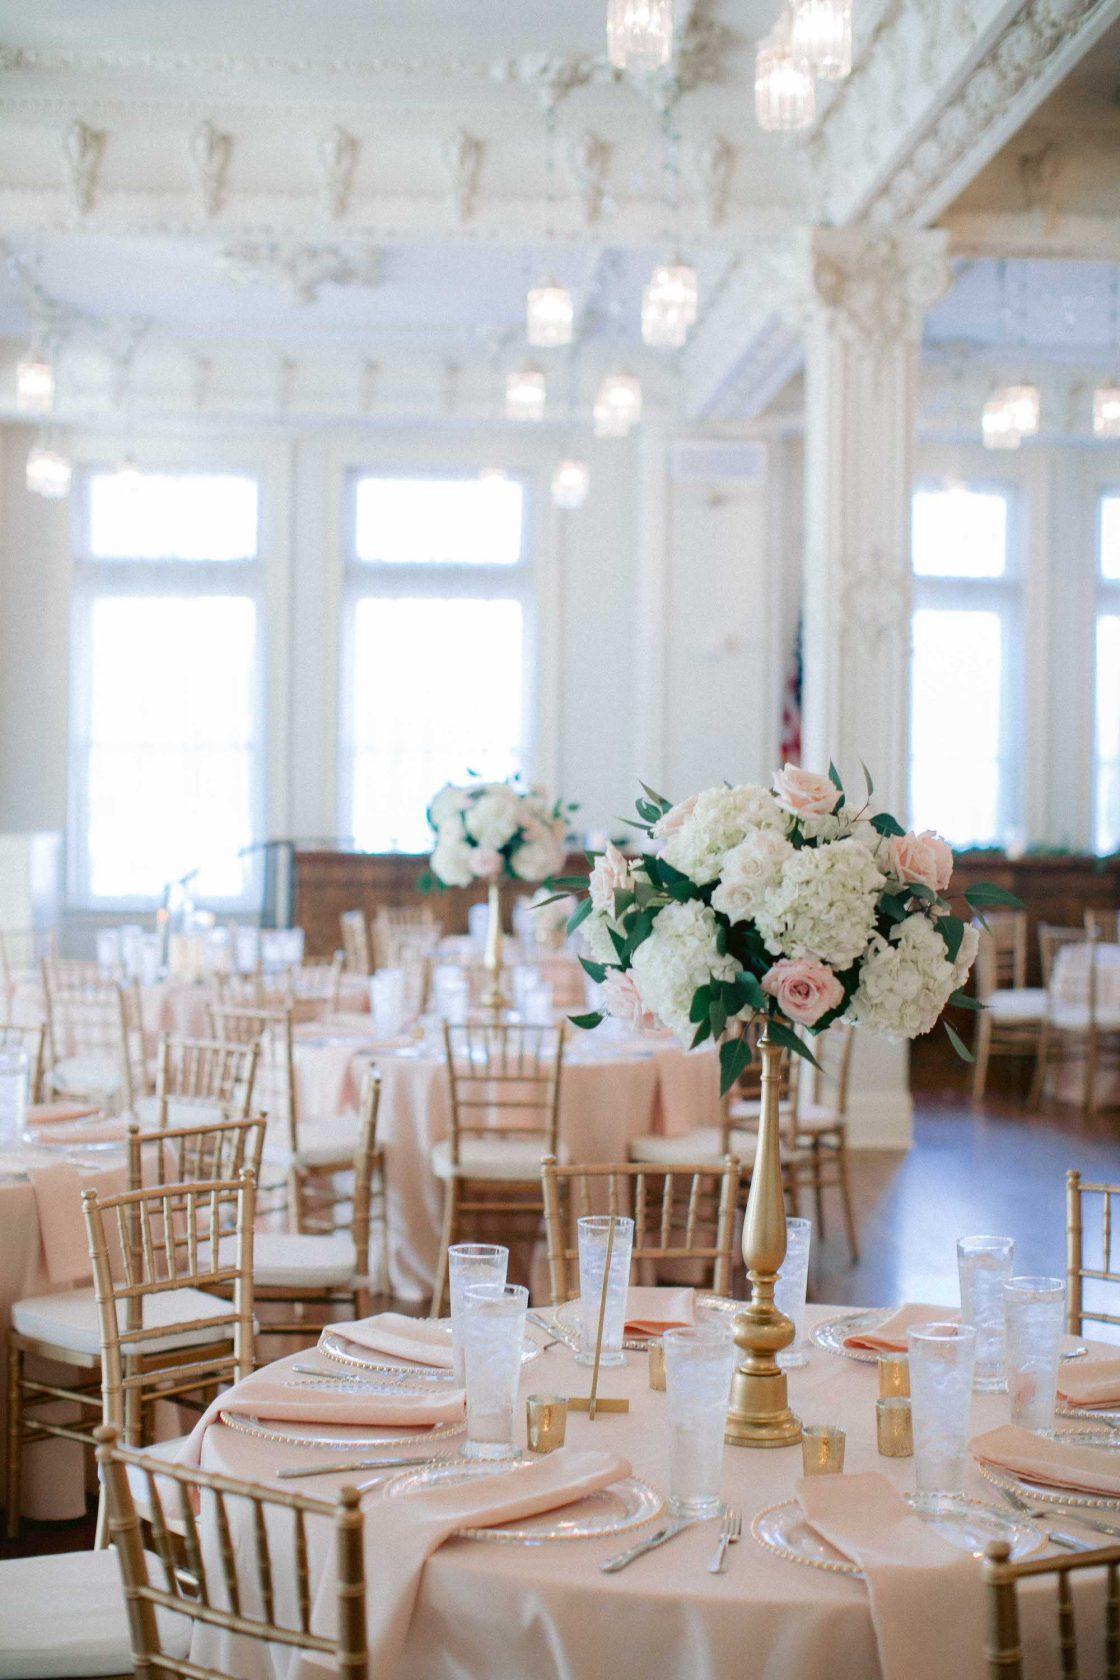 Blush and Ivory Wedding Reception